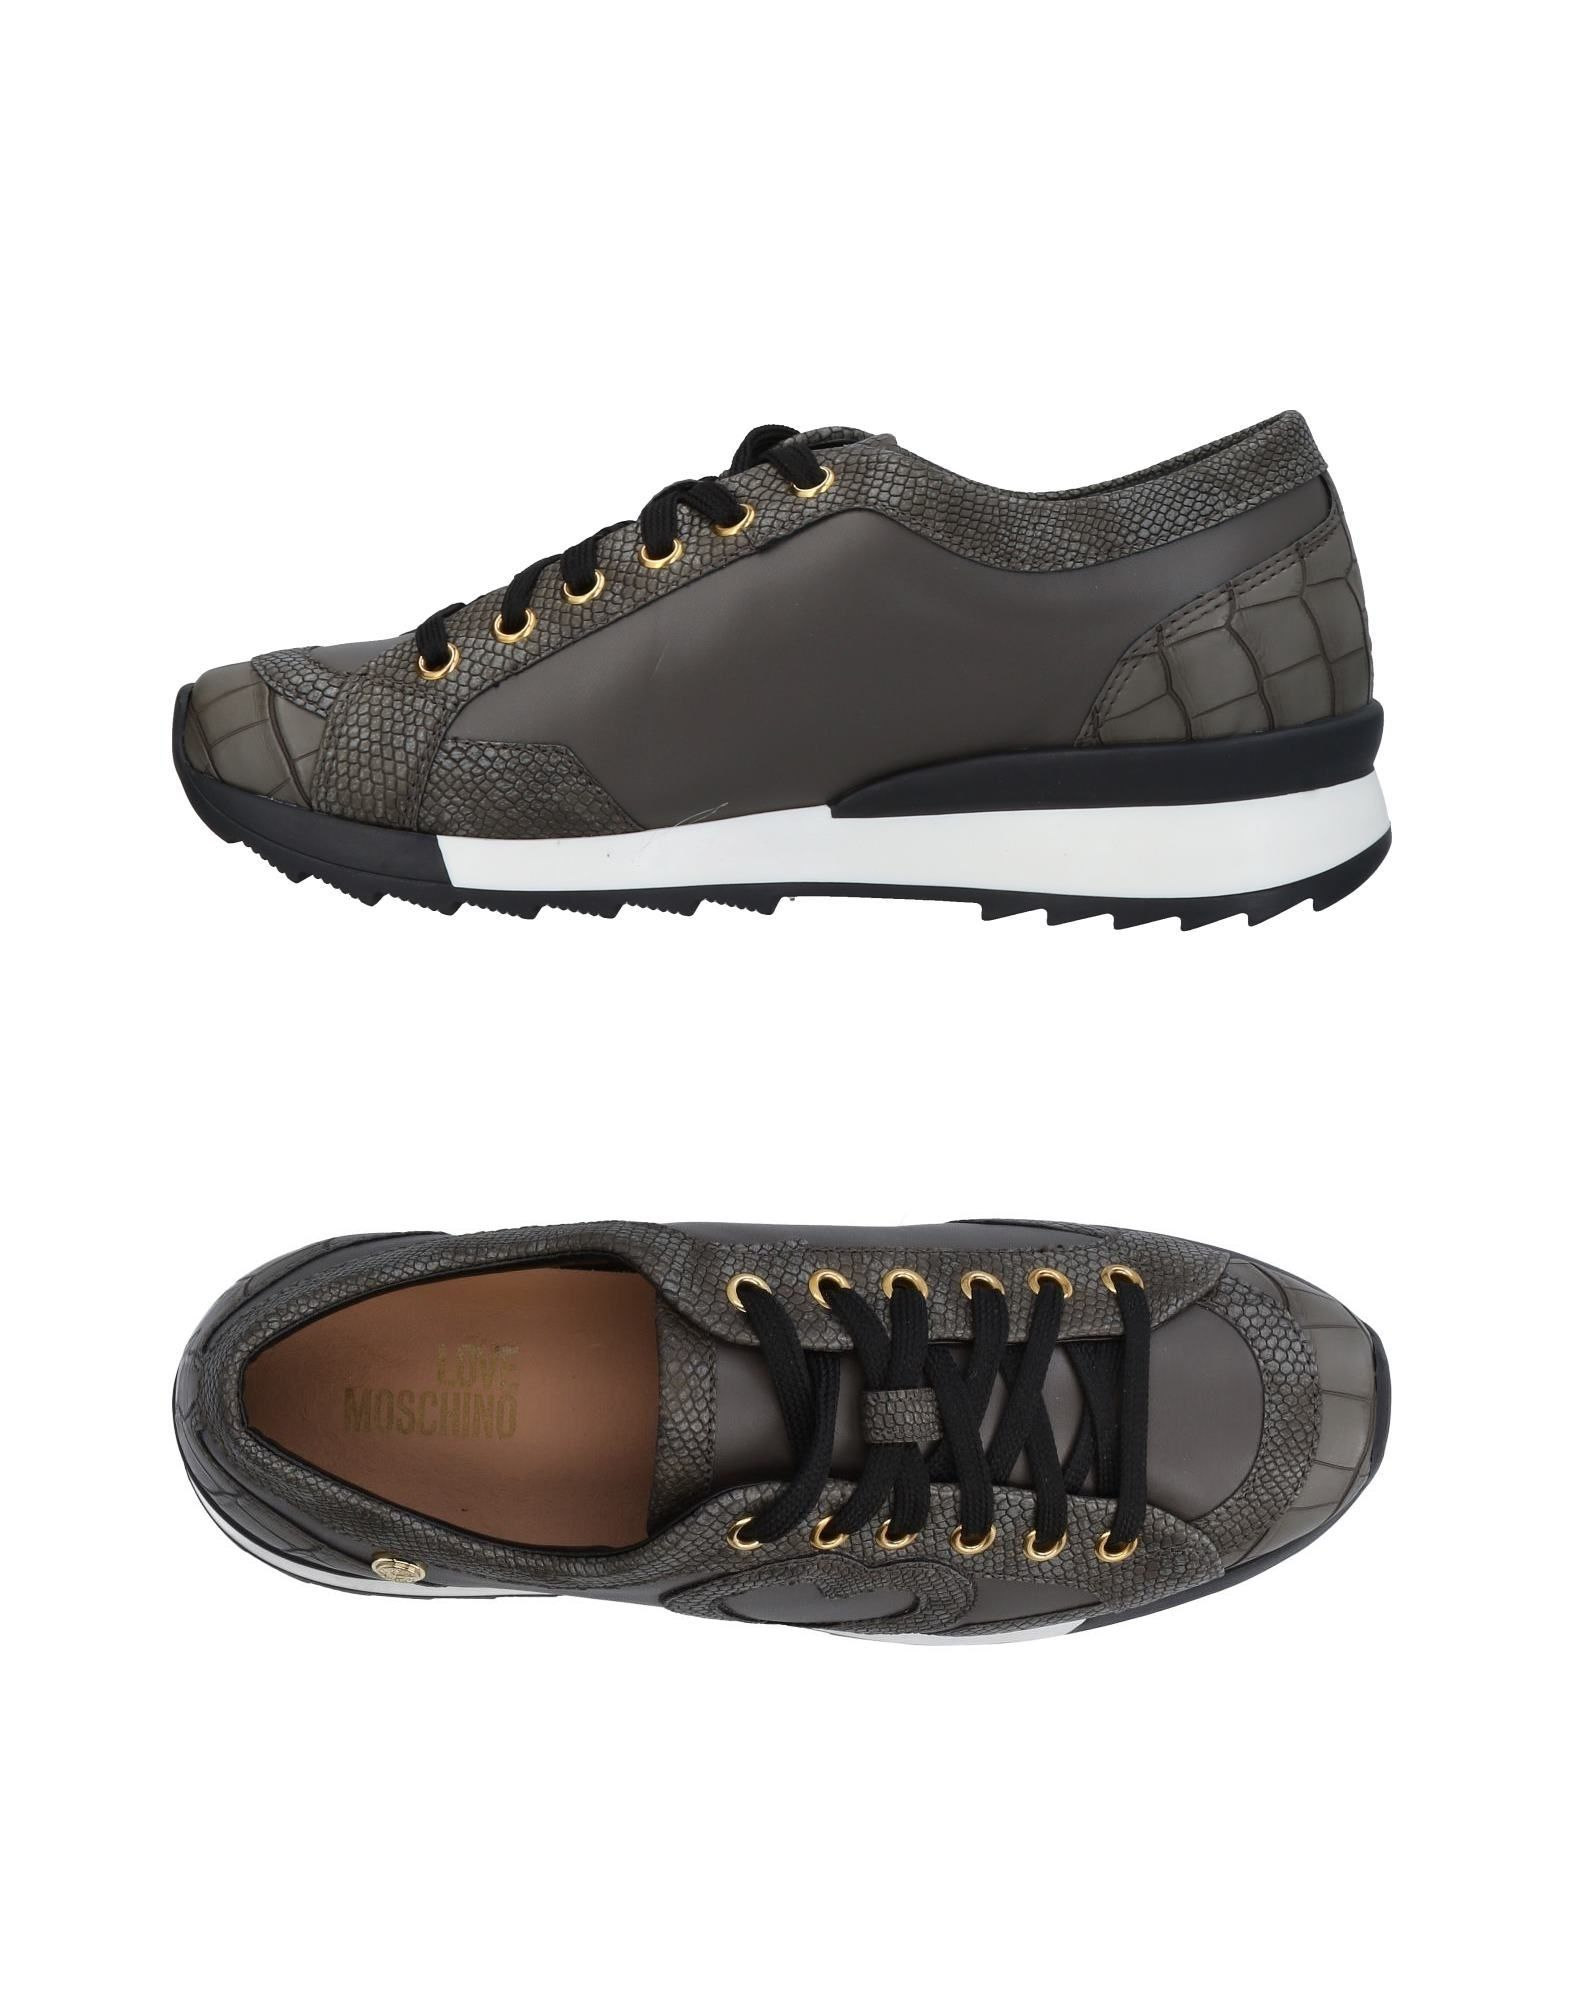 Stilvolle billige Schuhe Love Moschino Sneakers Damen  11451290FO